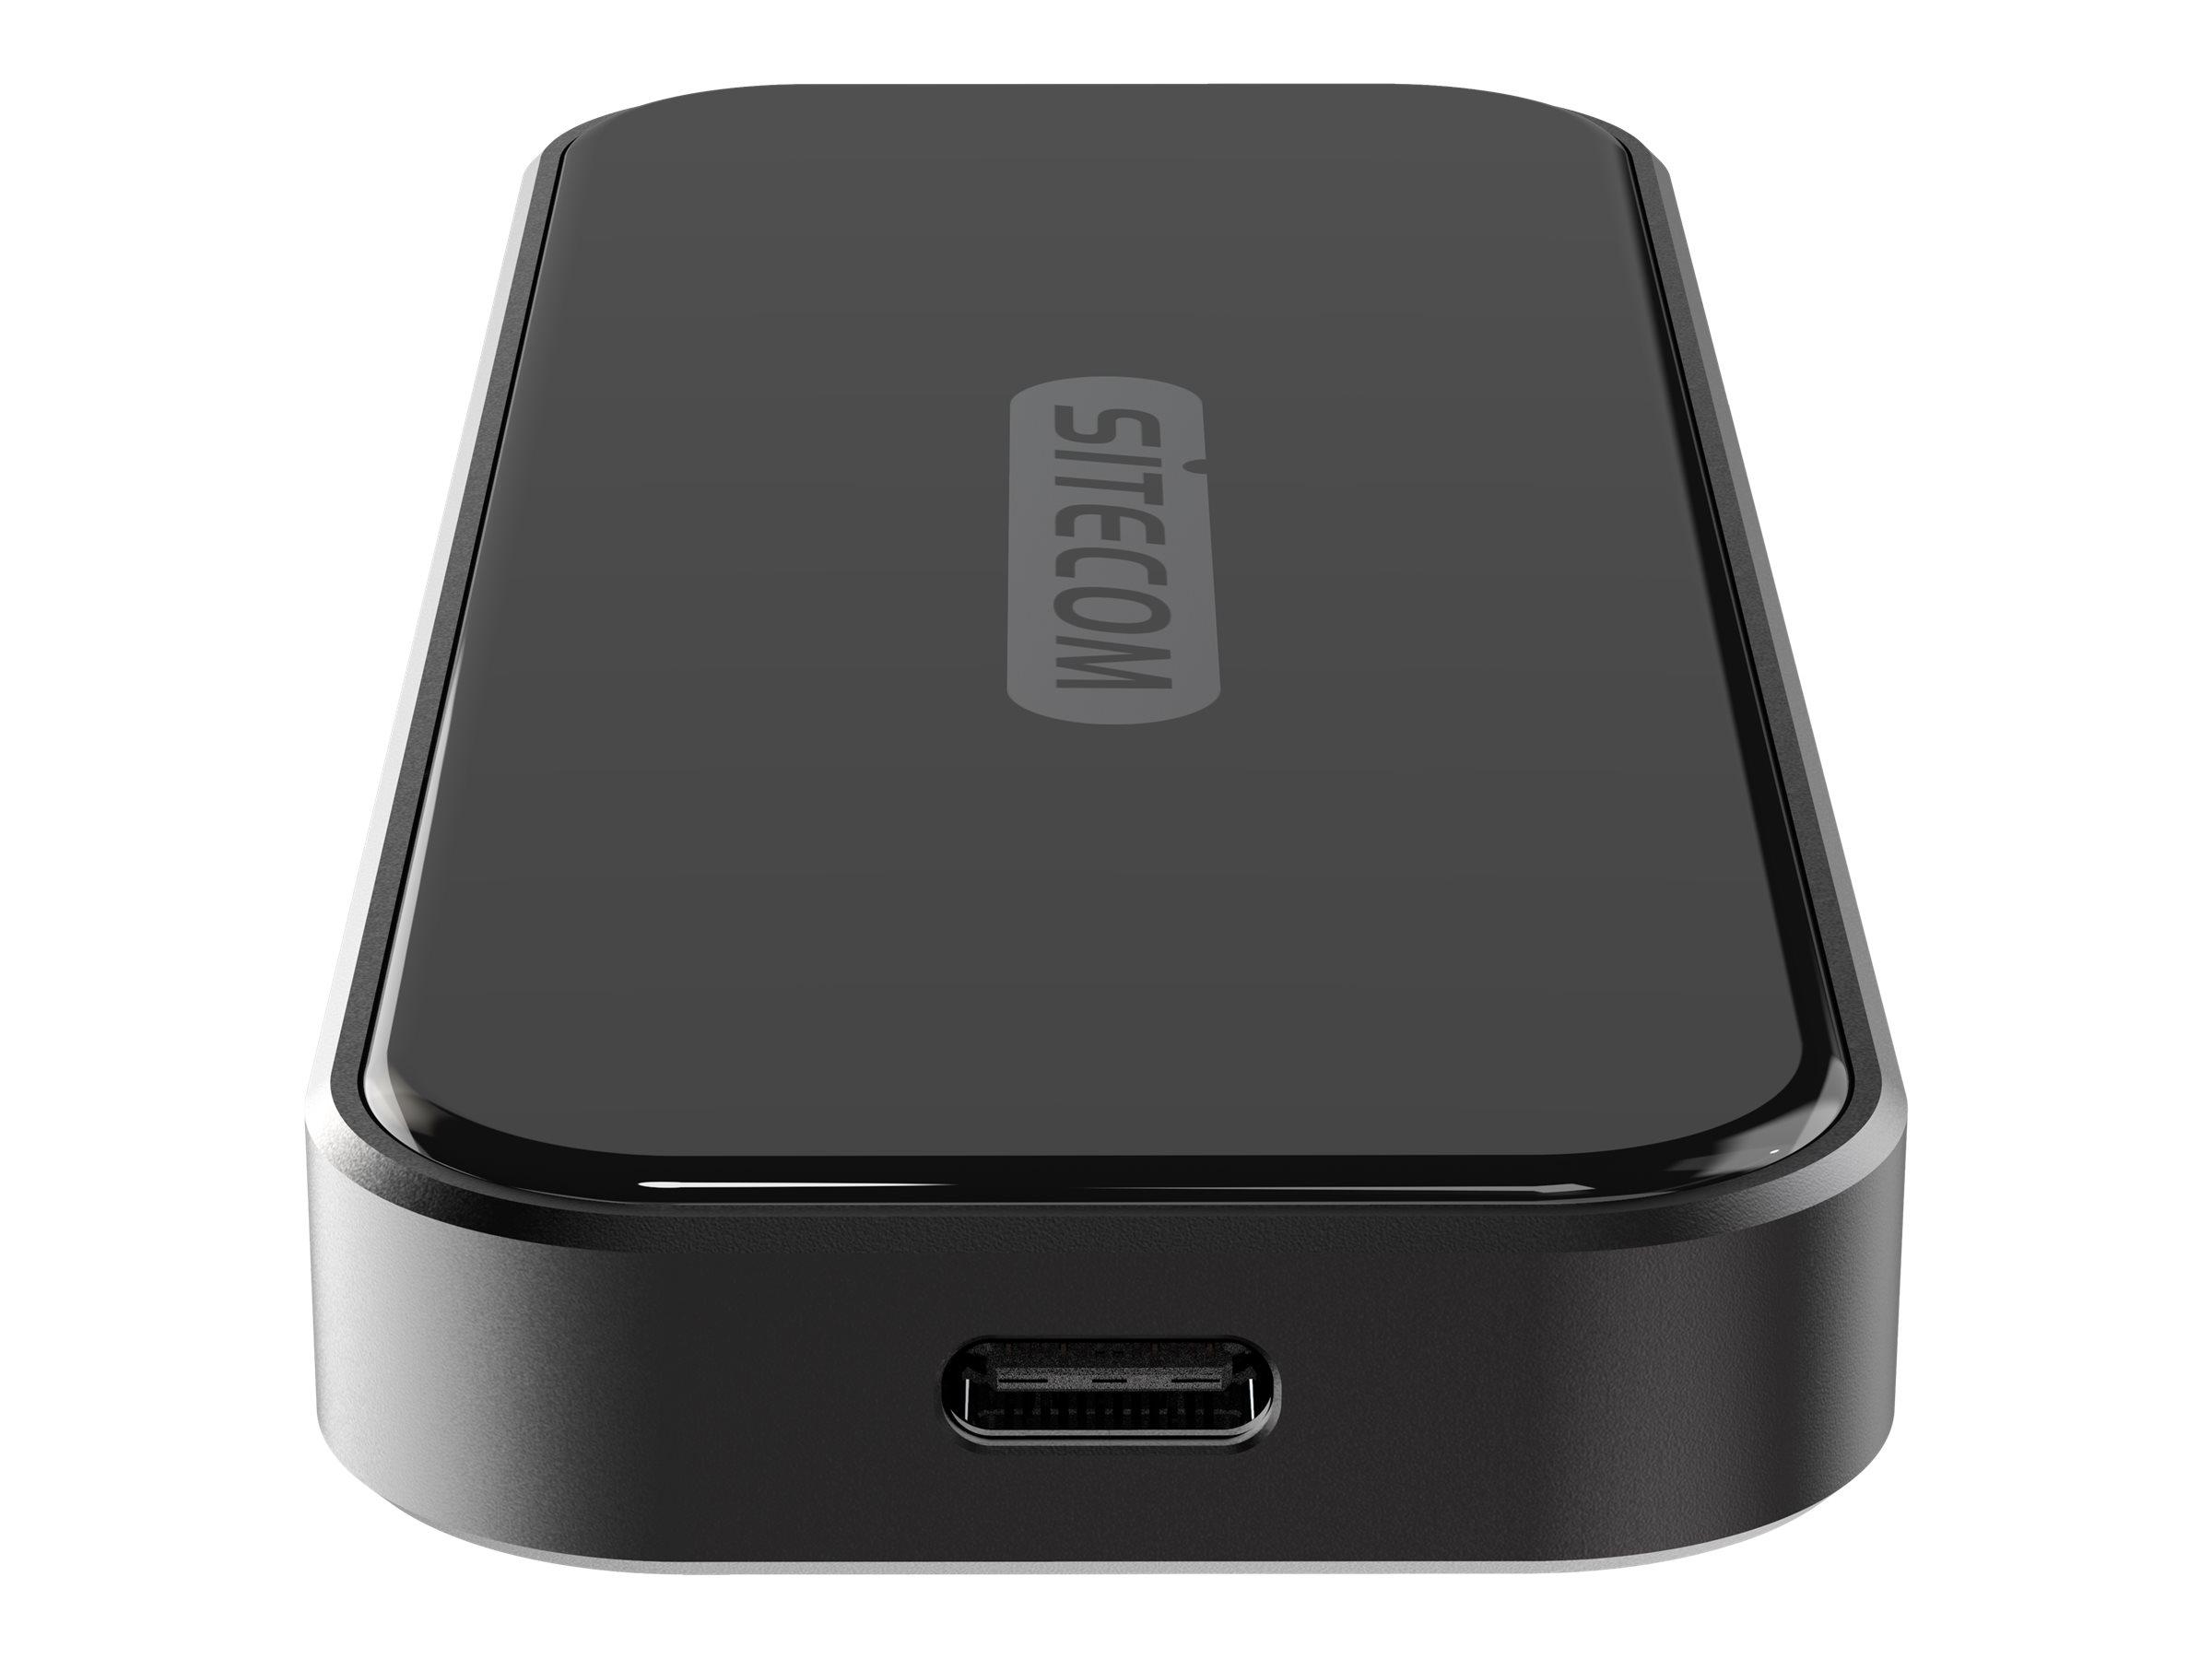 Sitecom CN 393 - Dockingstation - USB-C 3.1 - HDMI